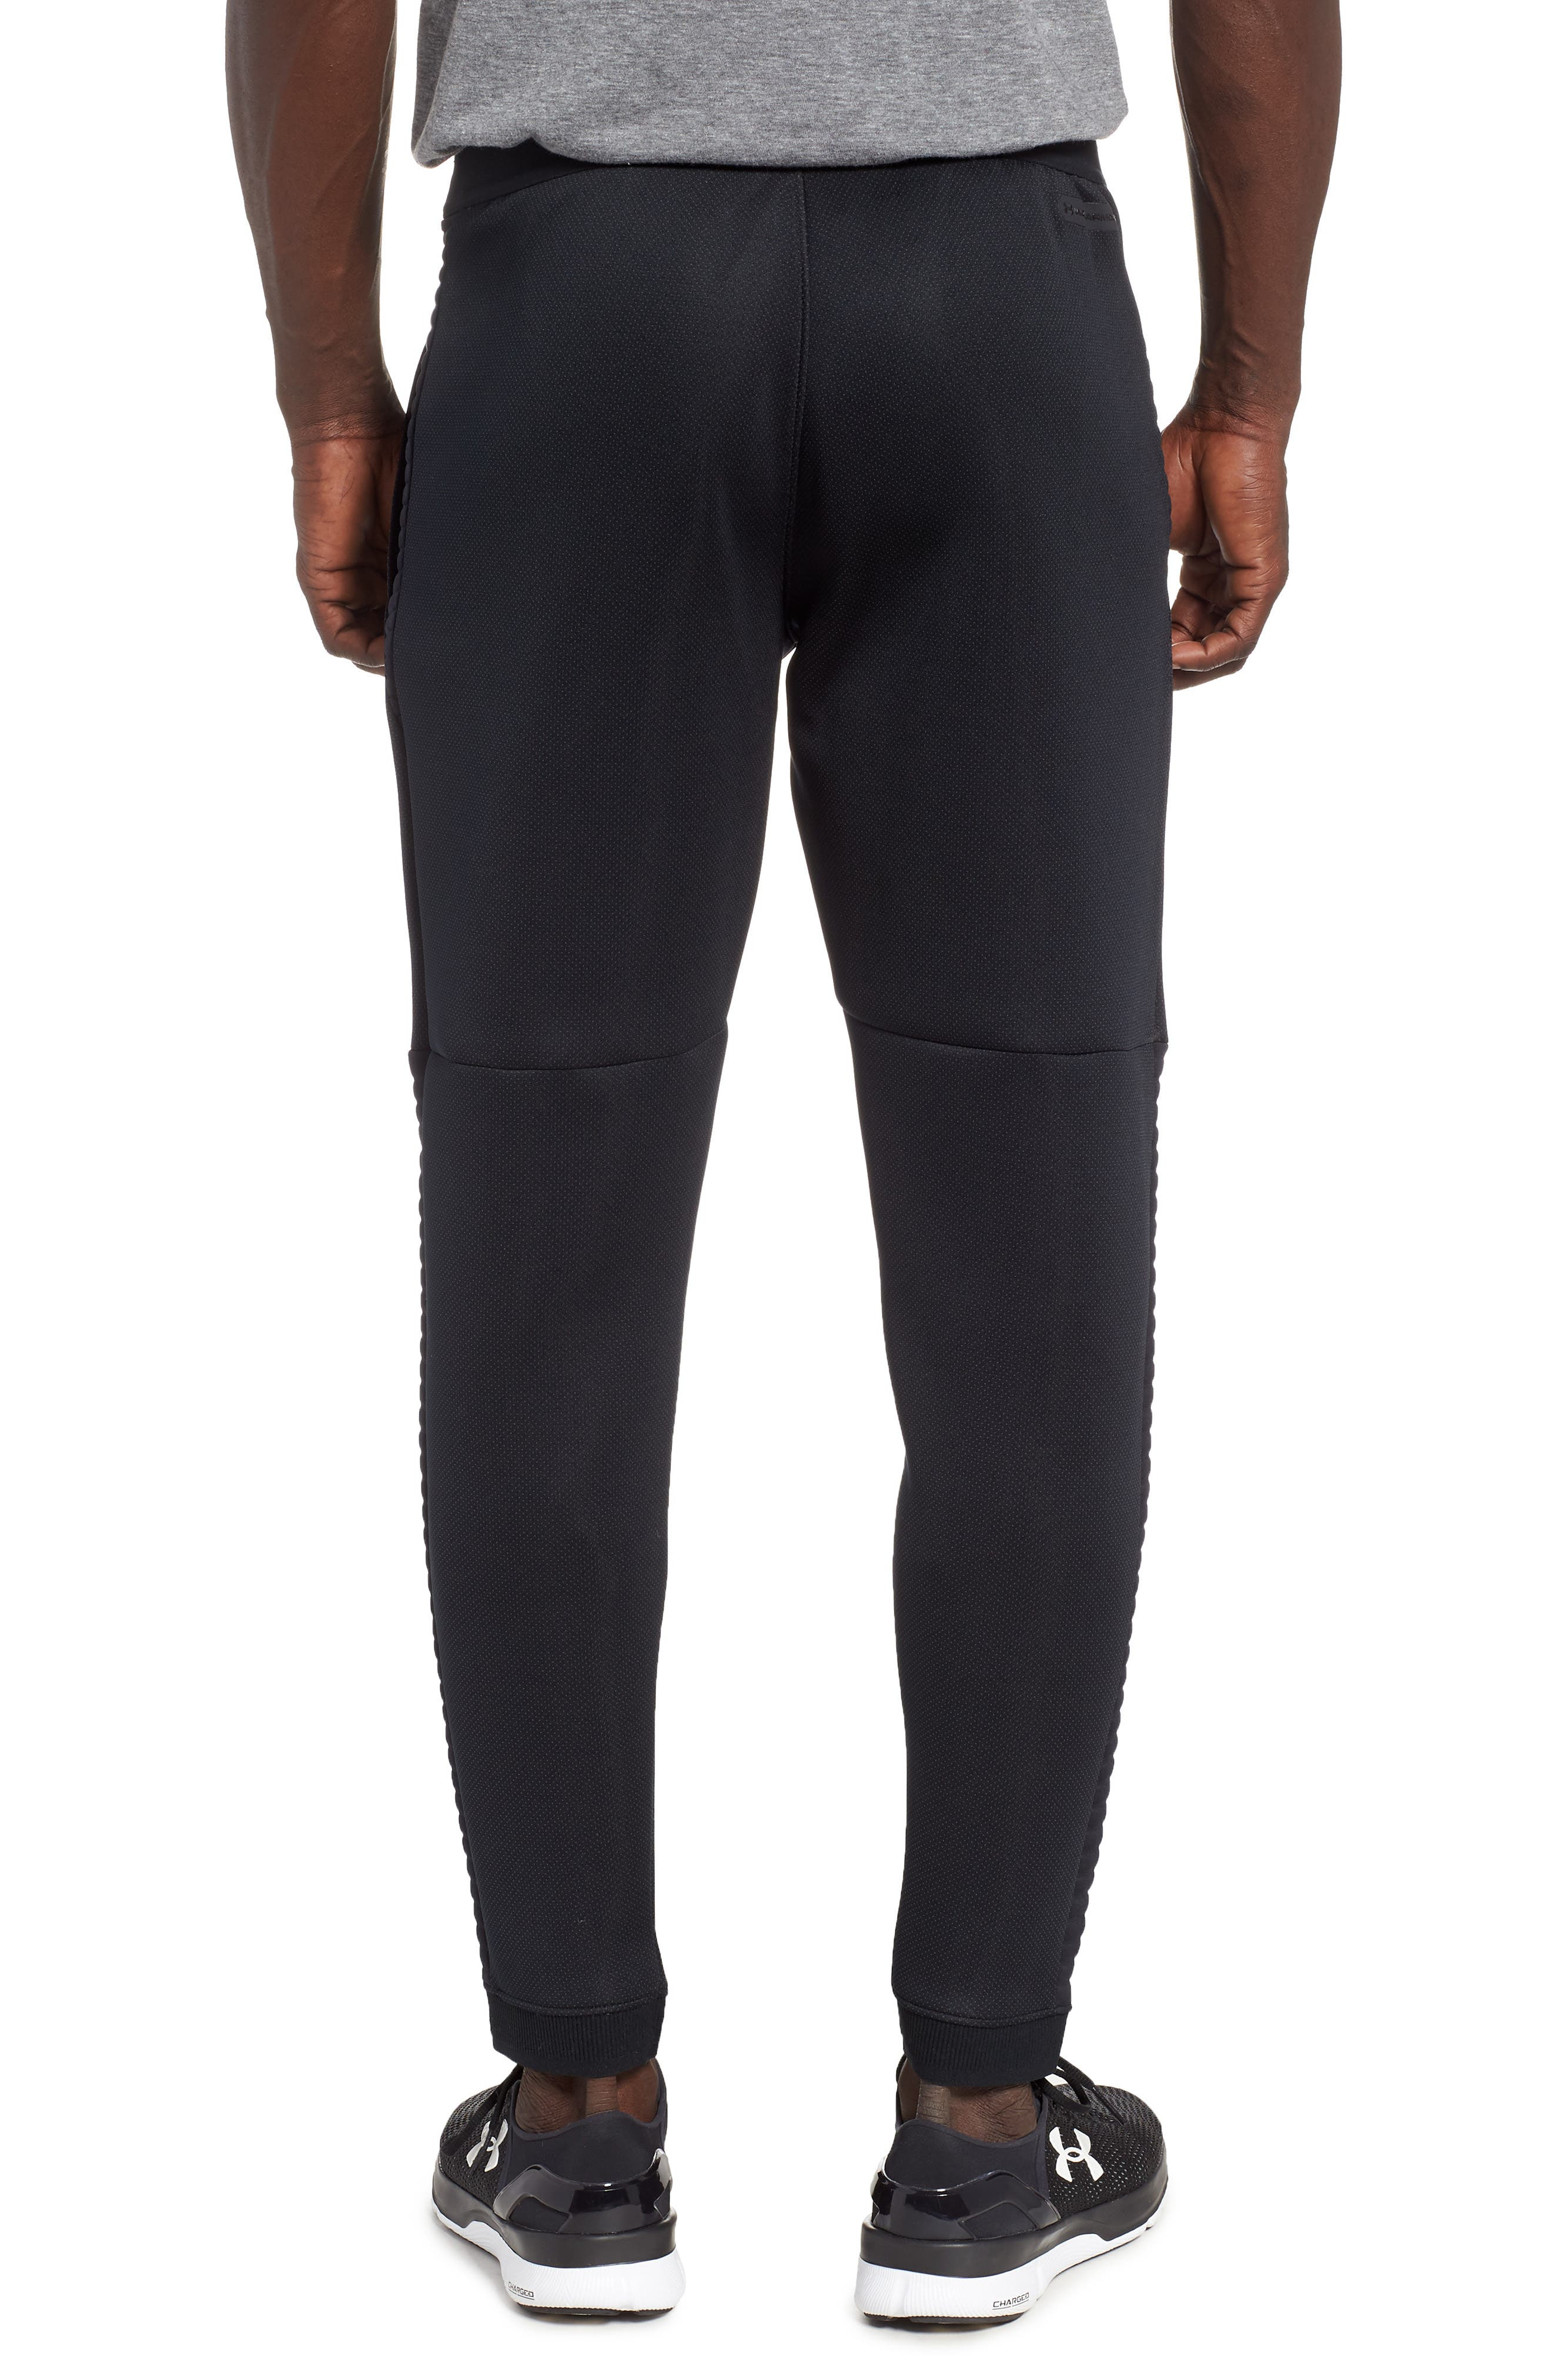 Unstoppable Move Airgap Pants,                             Alternate thumbnail 2, color,                             BLACK/ CHARCOAL/ BLACK